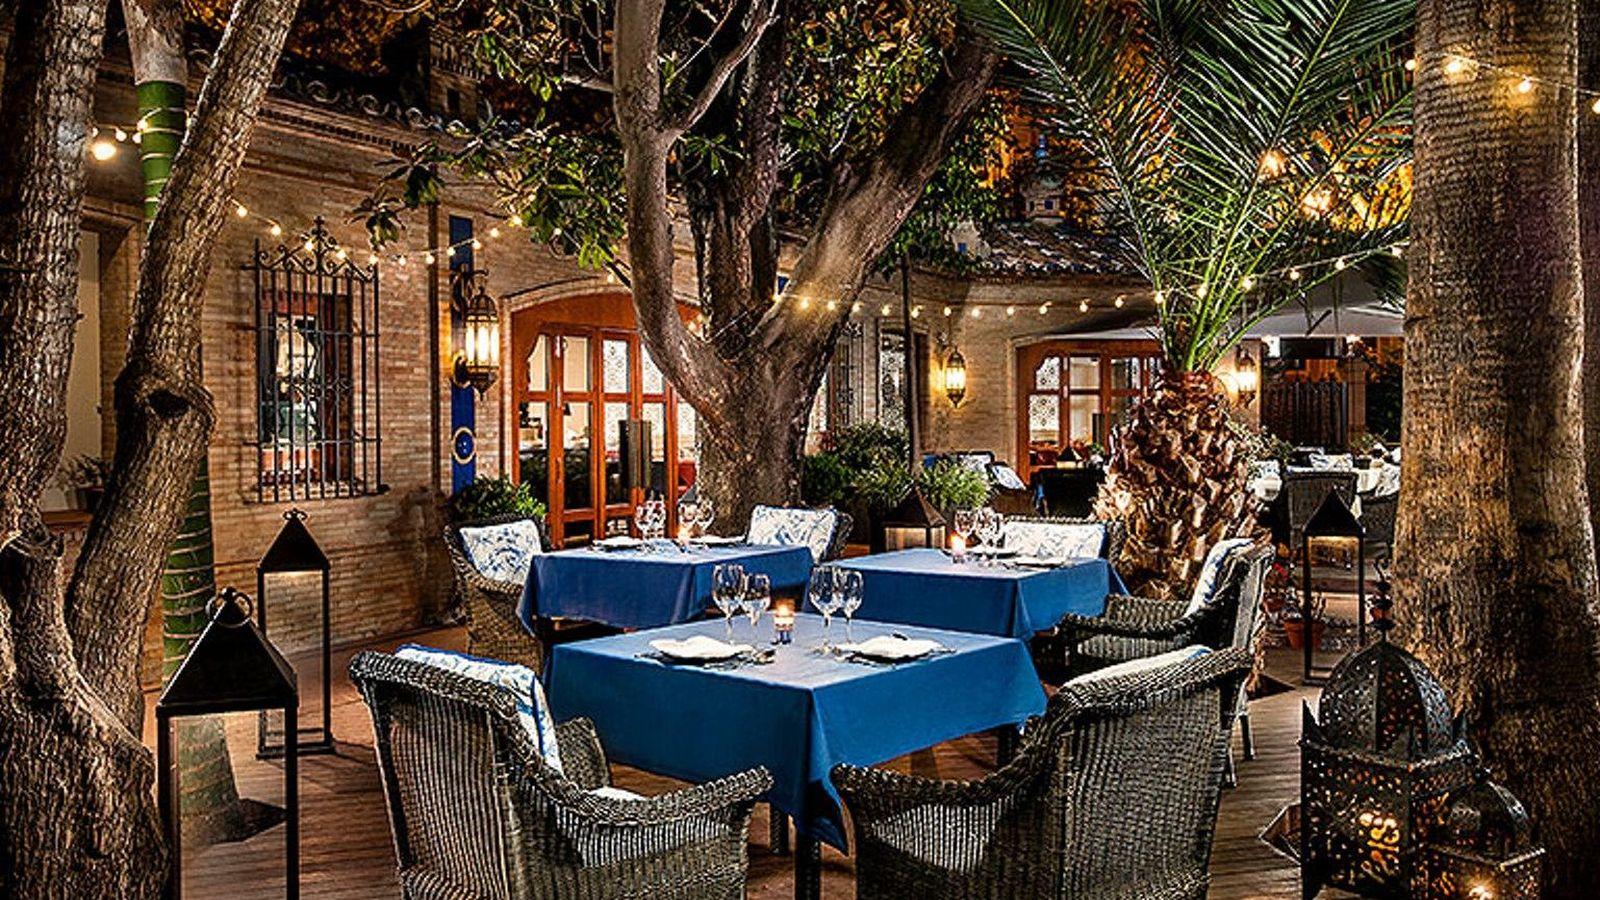 Gastronom a en hoteles 5 terrazas en hoteles 5 estrellas for Hoteles de lujo en vitoria